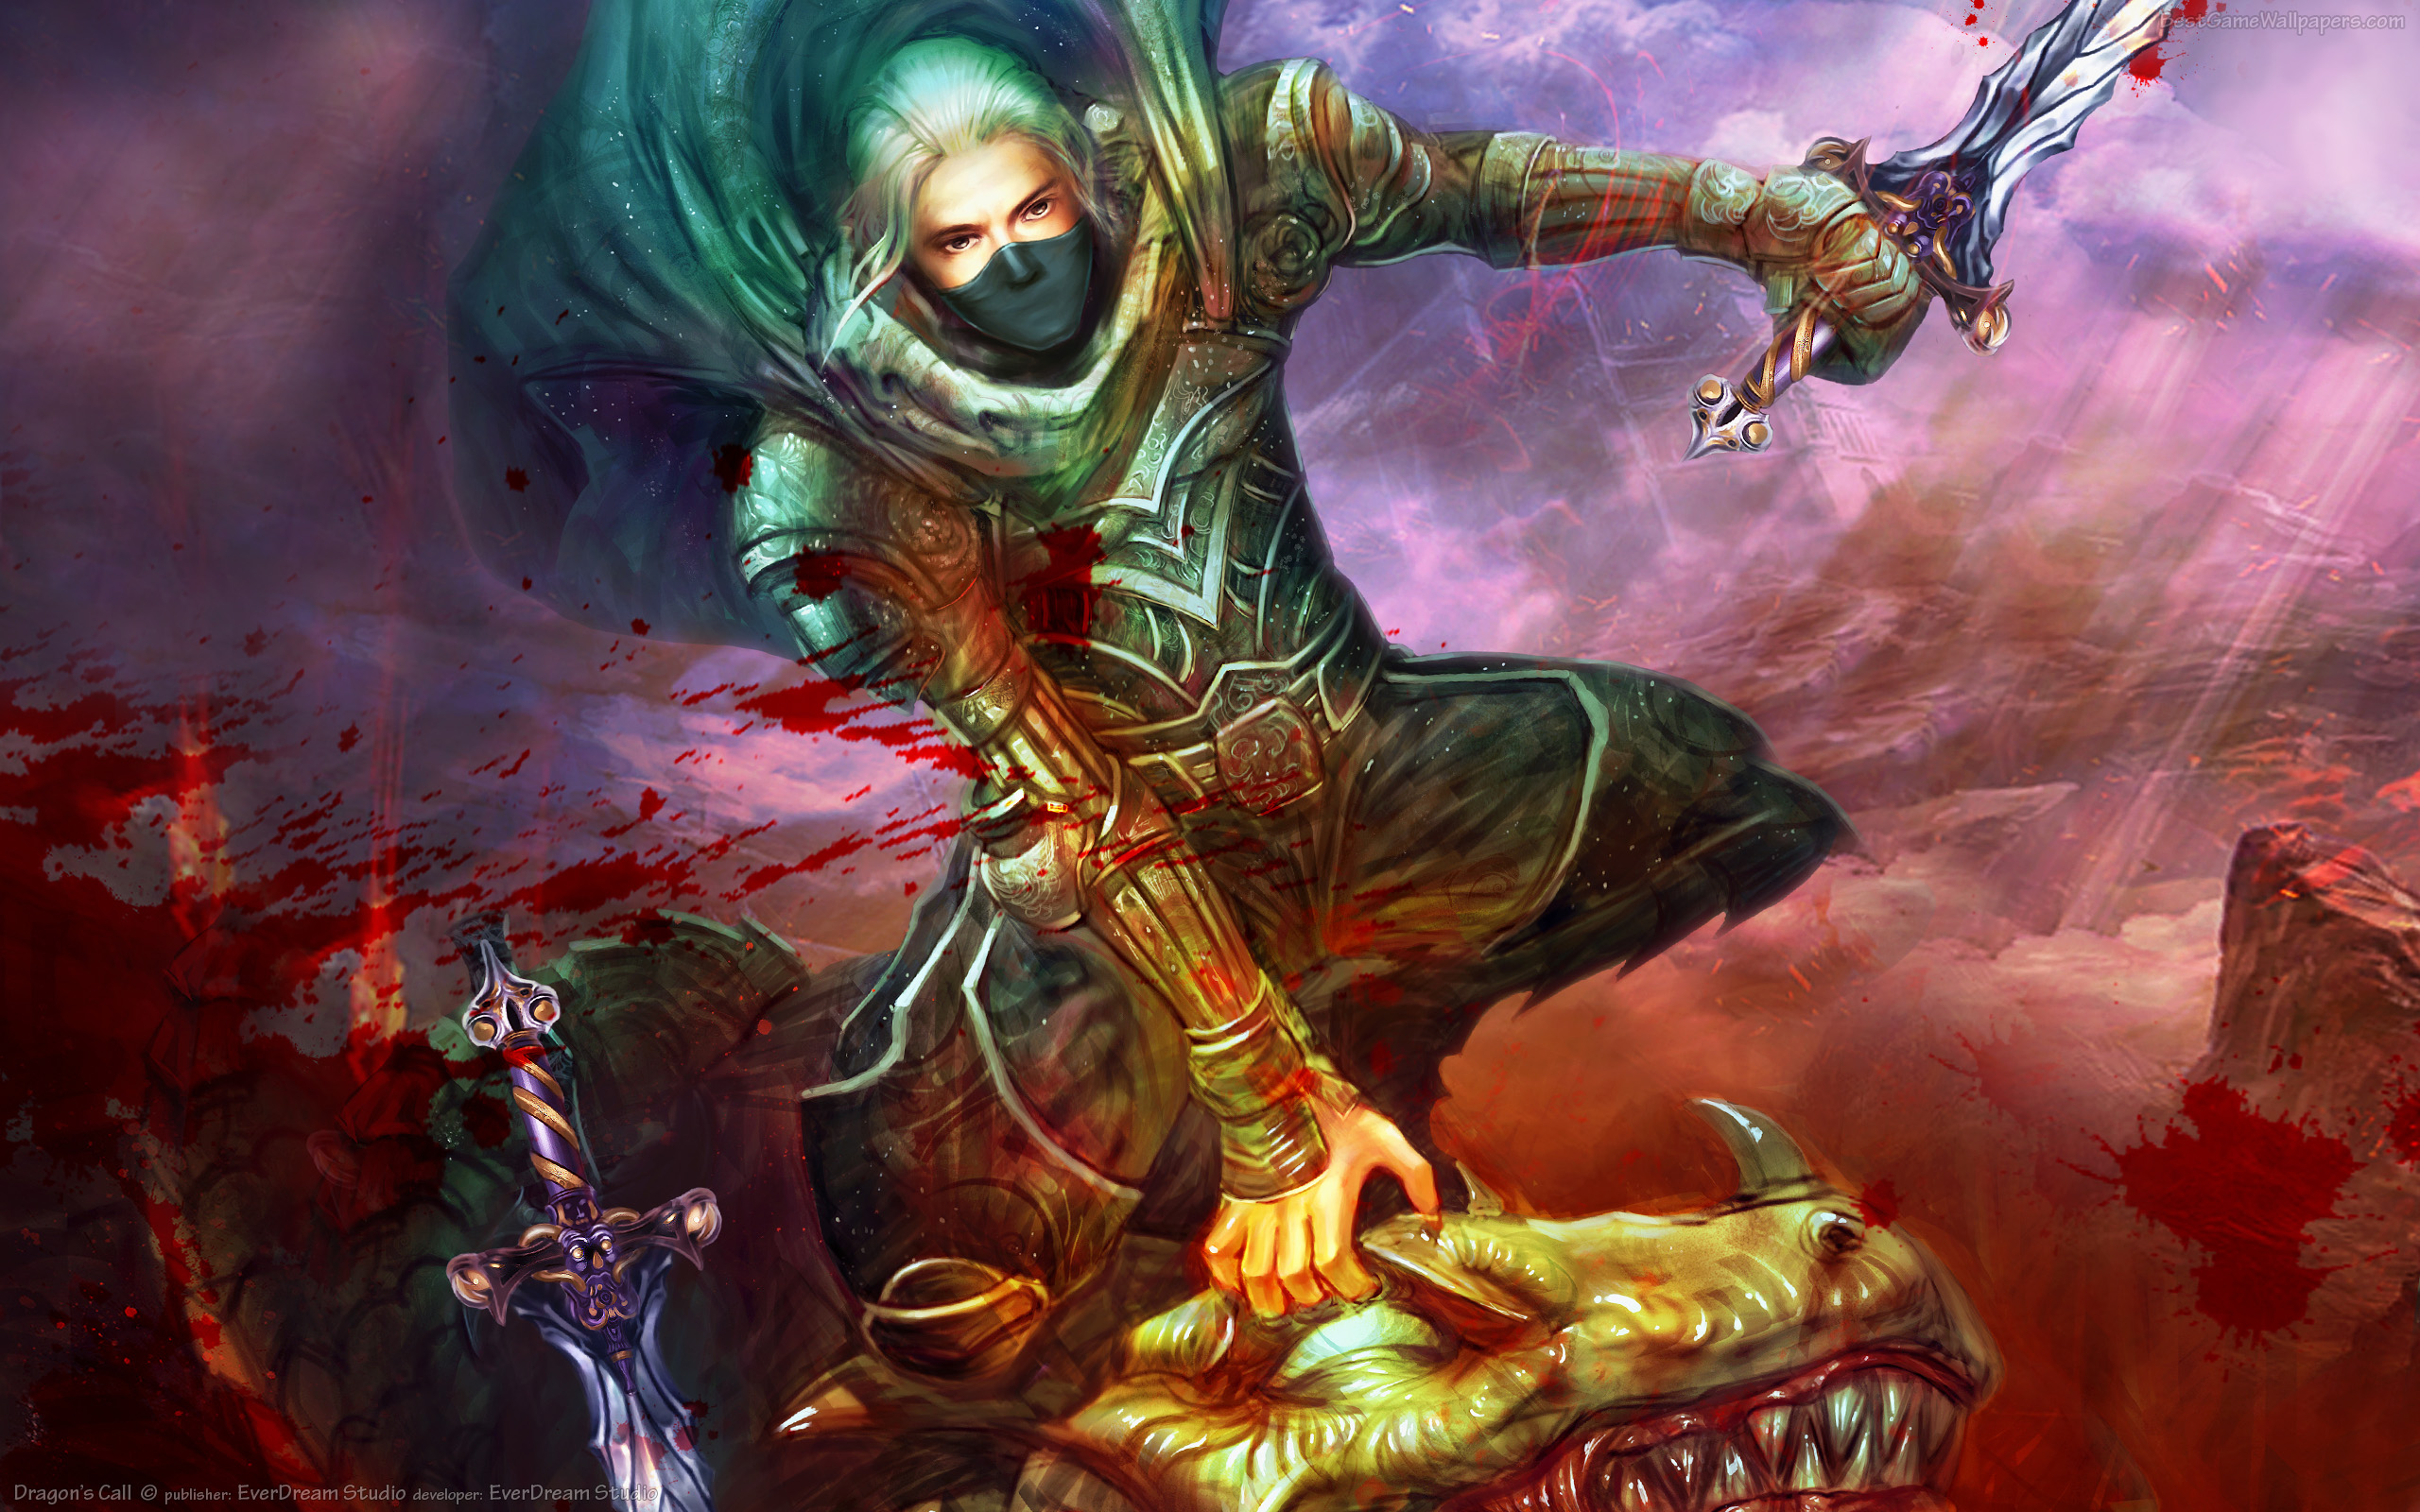 Dragon Slayer bestgamewallpaperscom 2560x1600